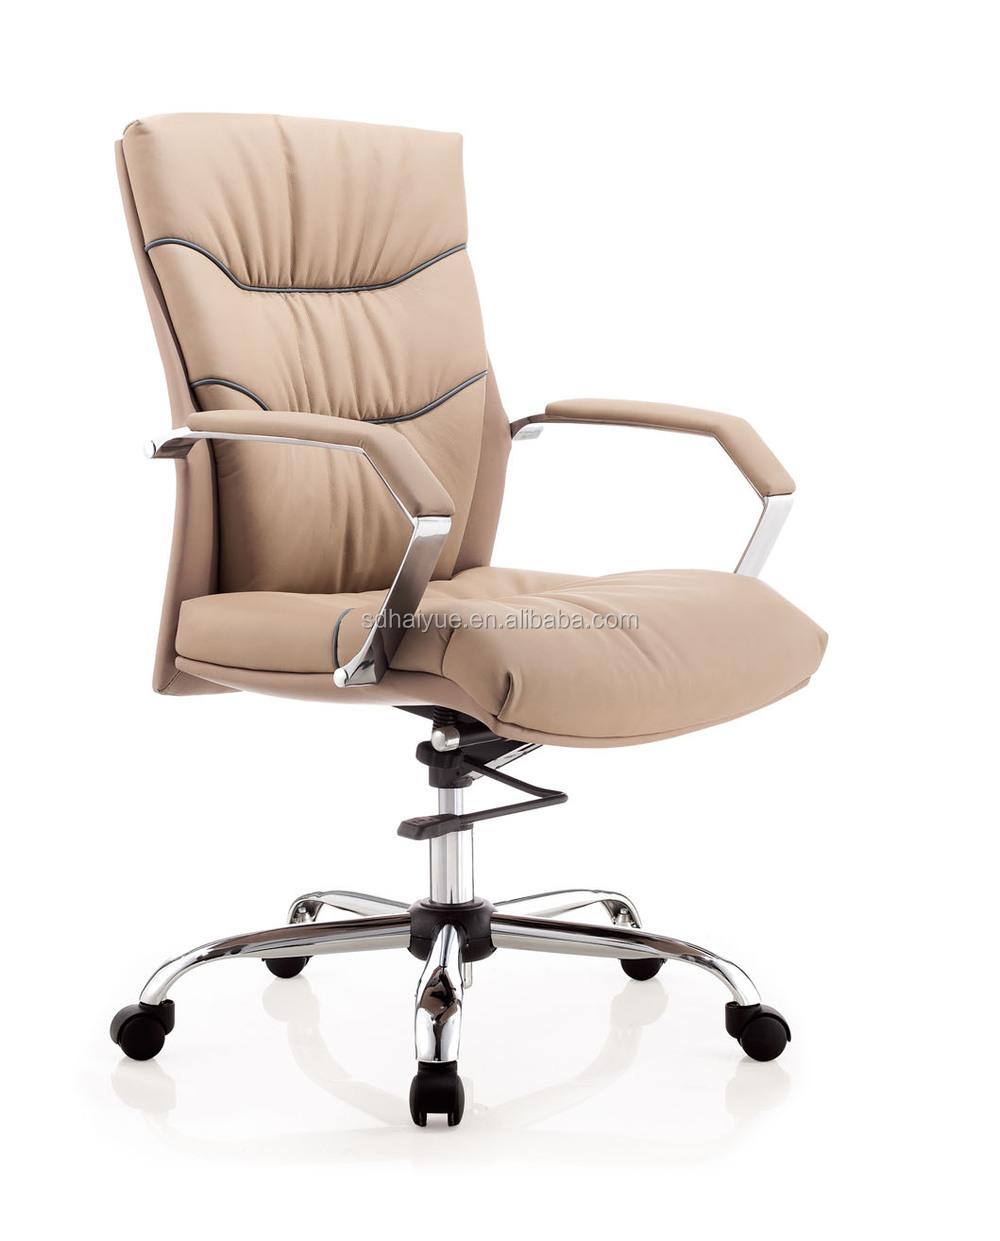 2015 best seller ergonomic office chair manager chair boss for Best home office chair 2015